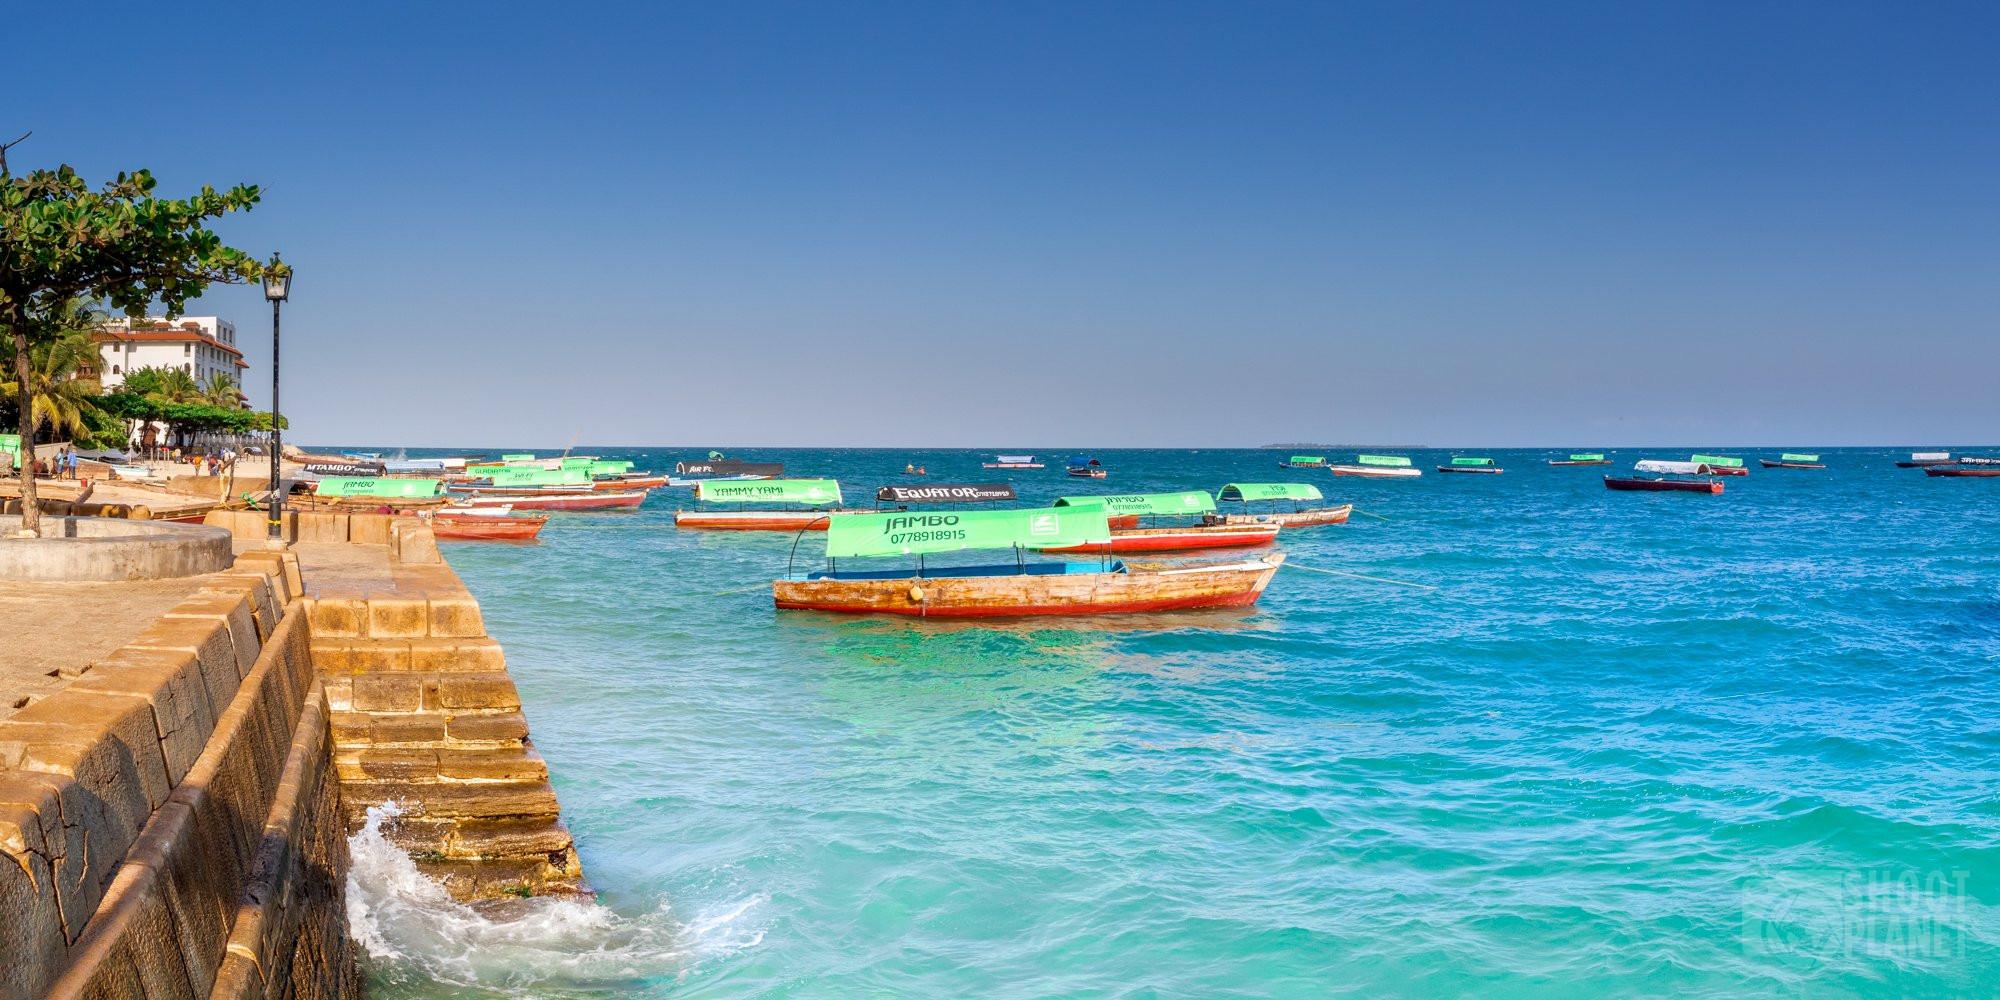 Stone Town ocean front, Zanzibar Tanzania